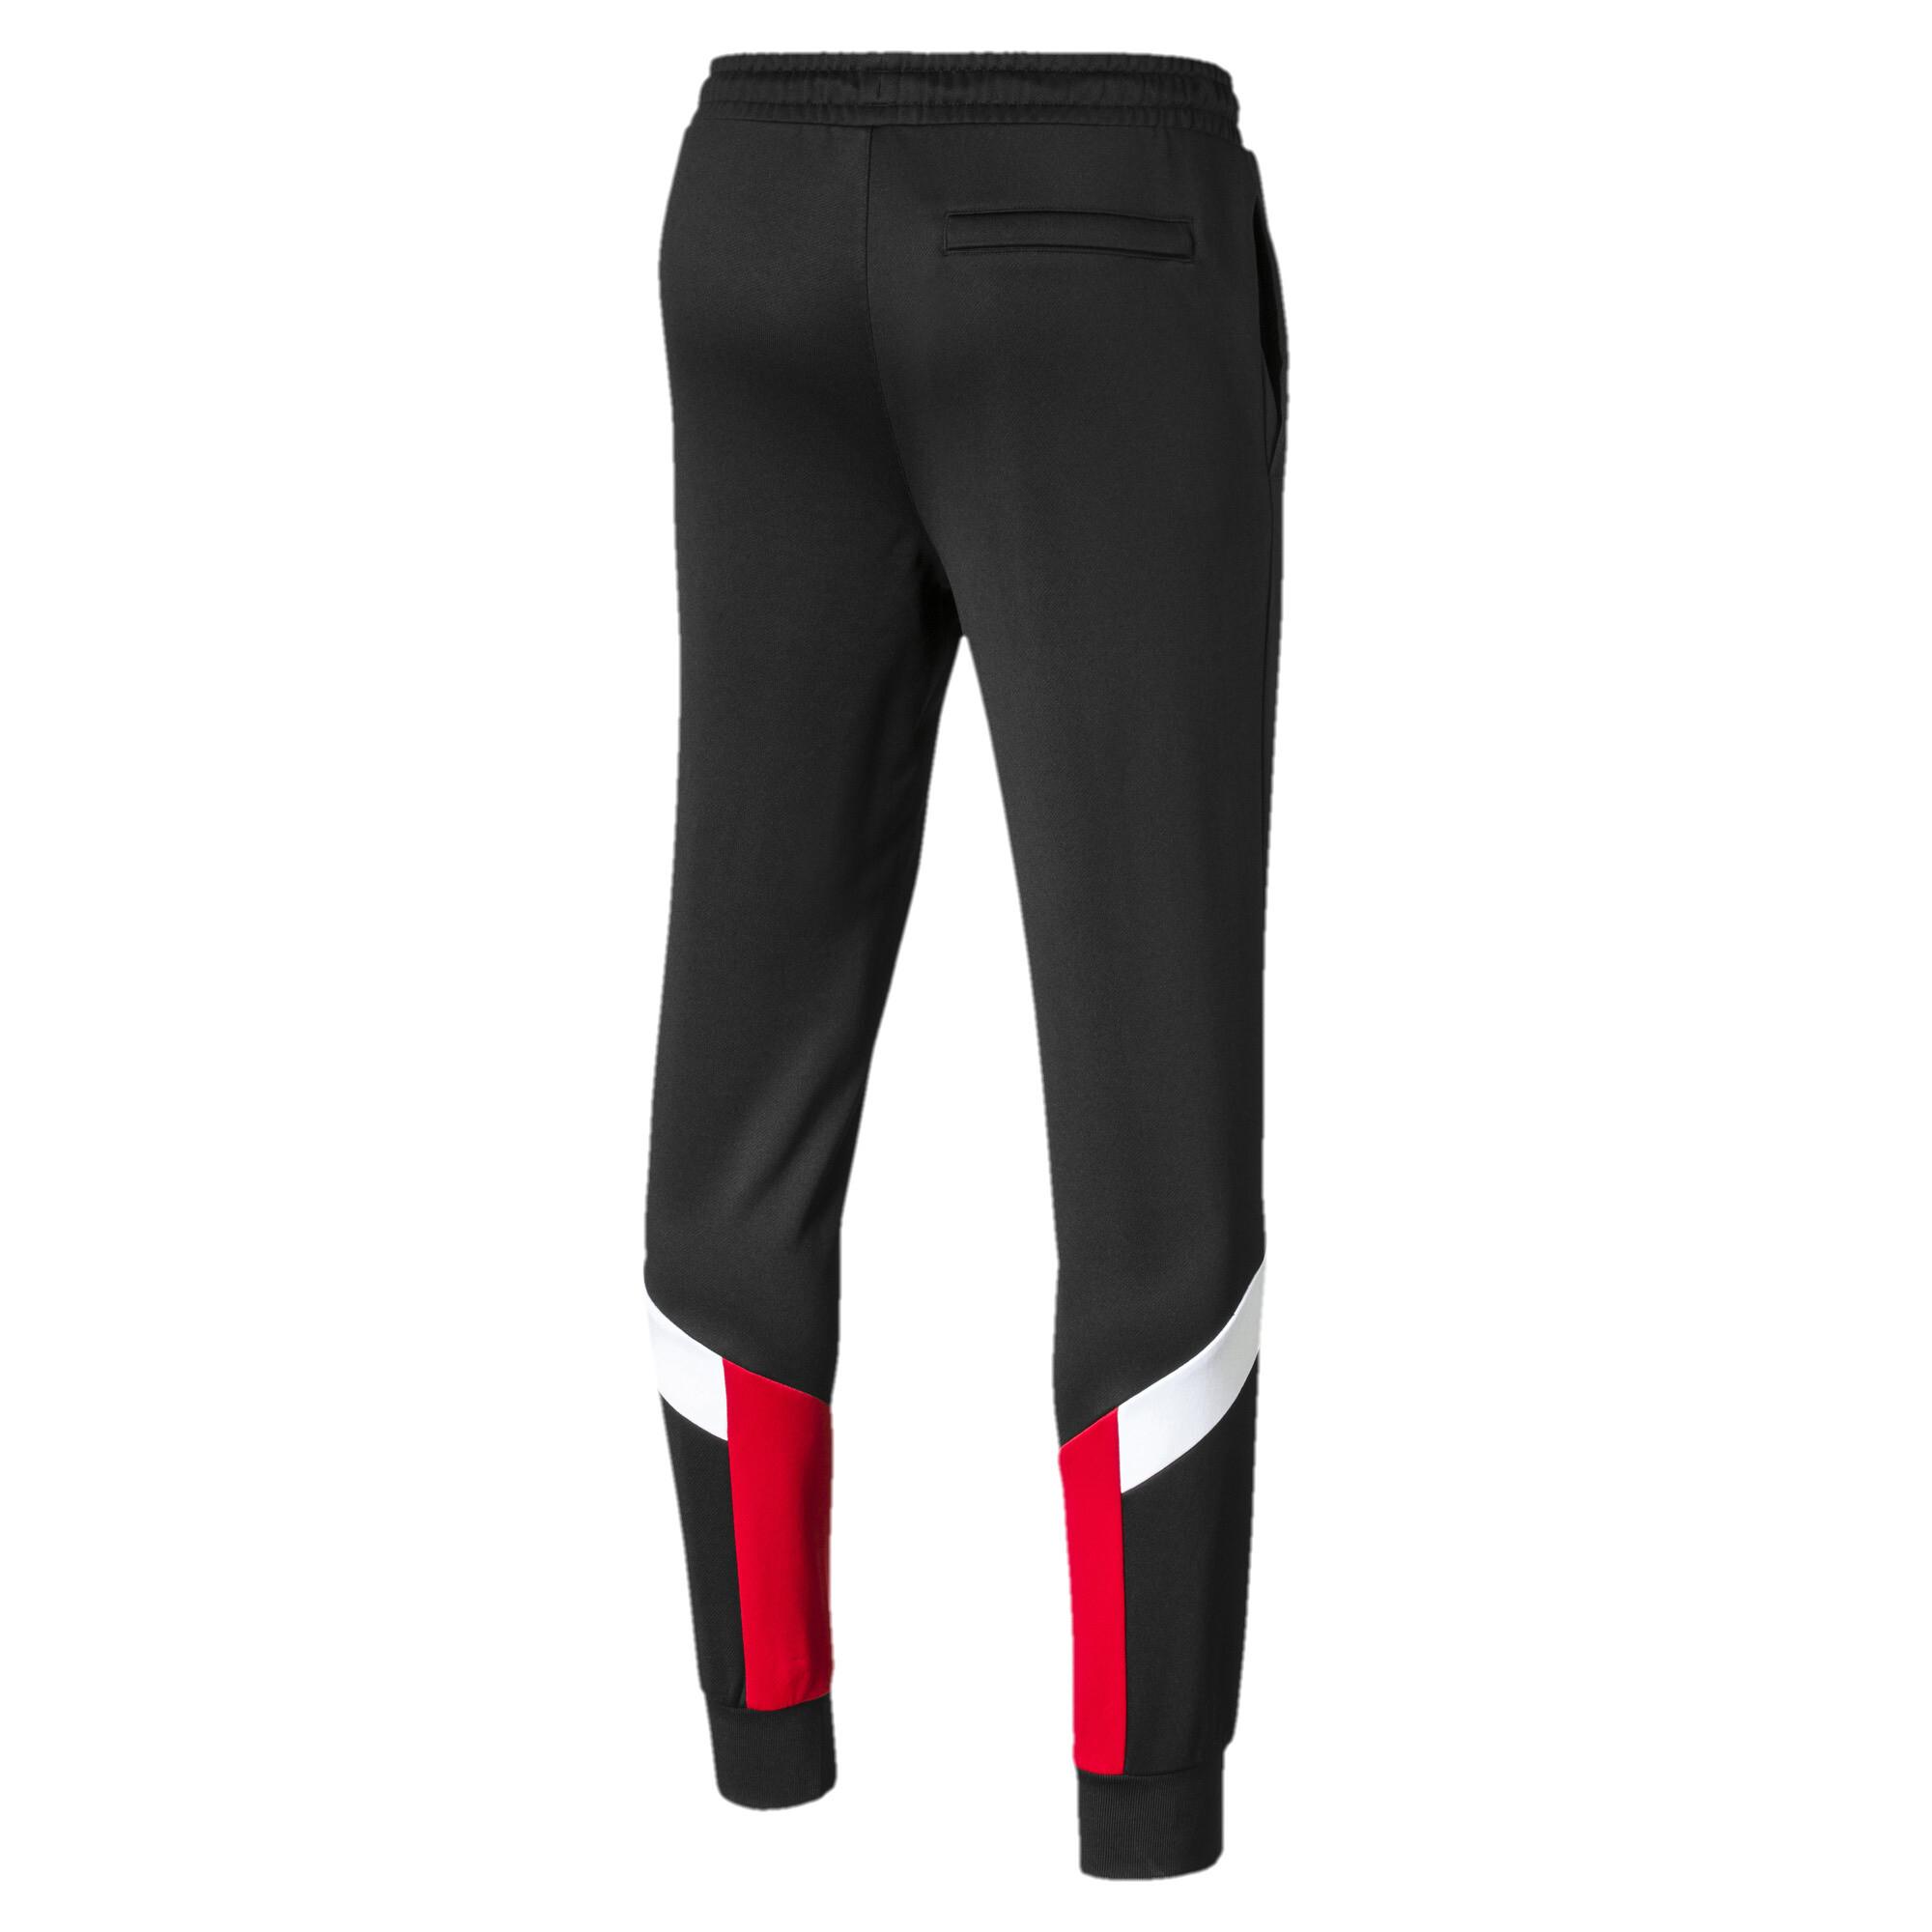 PUMA-Iconic-MCS-Men-039-s-Track-Pants-Men-Knitted-Pants-Sport-Classics thumbnail 3